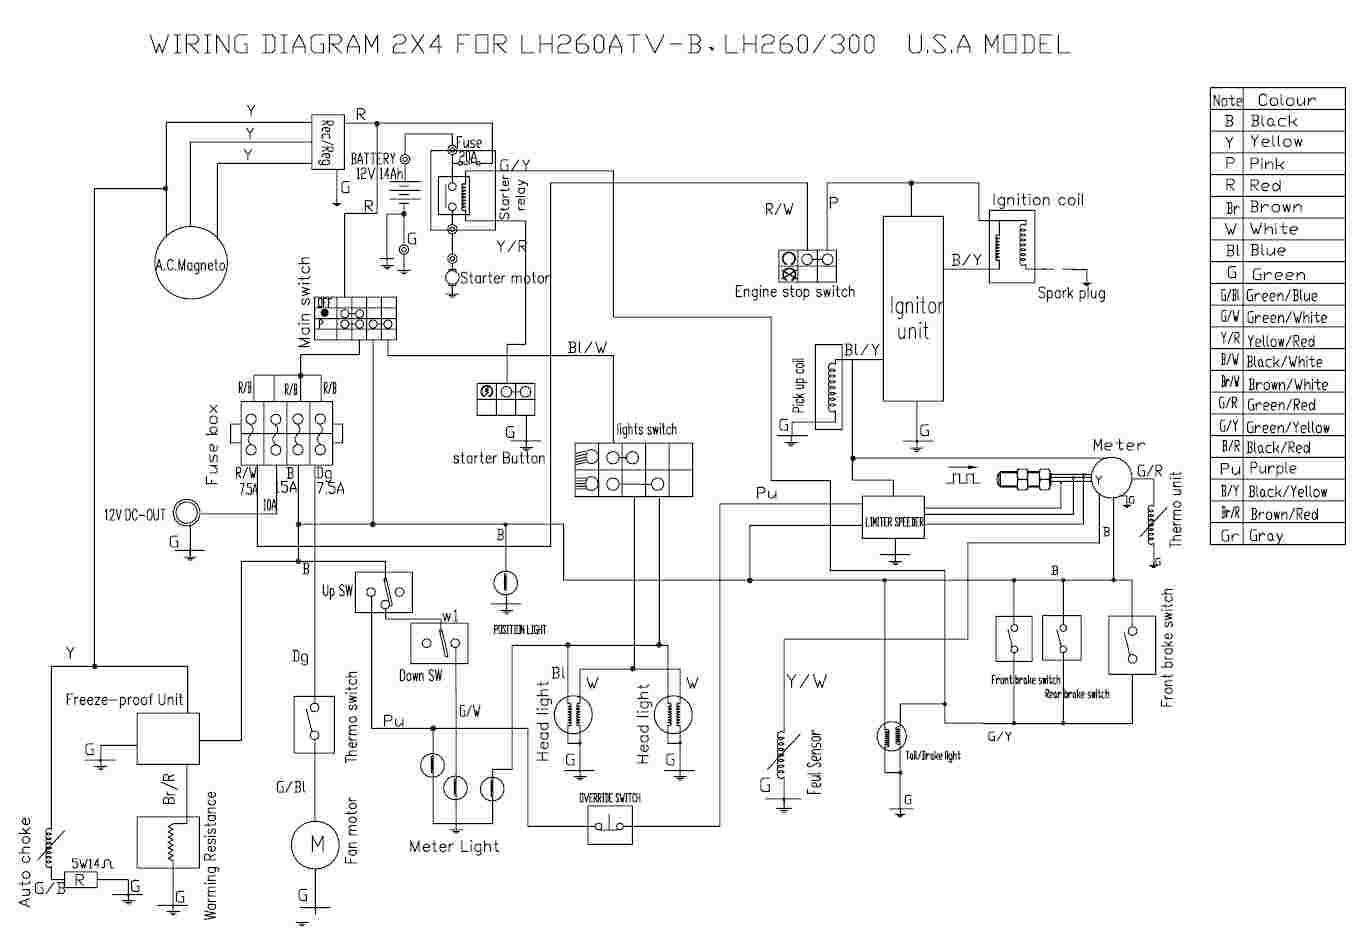 2002 Kawasaki Bayou Wiring Data Diagrams 250 Diagram Polaris Sportsman 500 Cooling Fan Atv